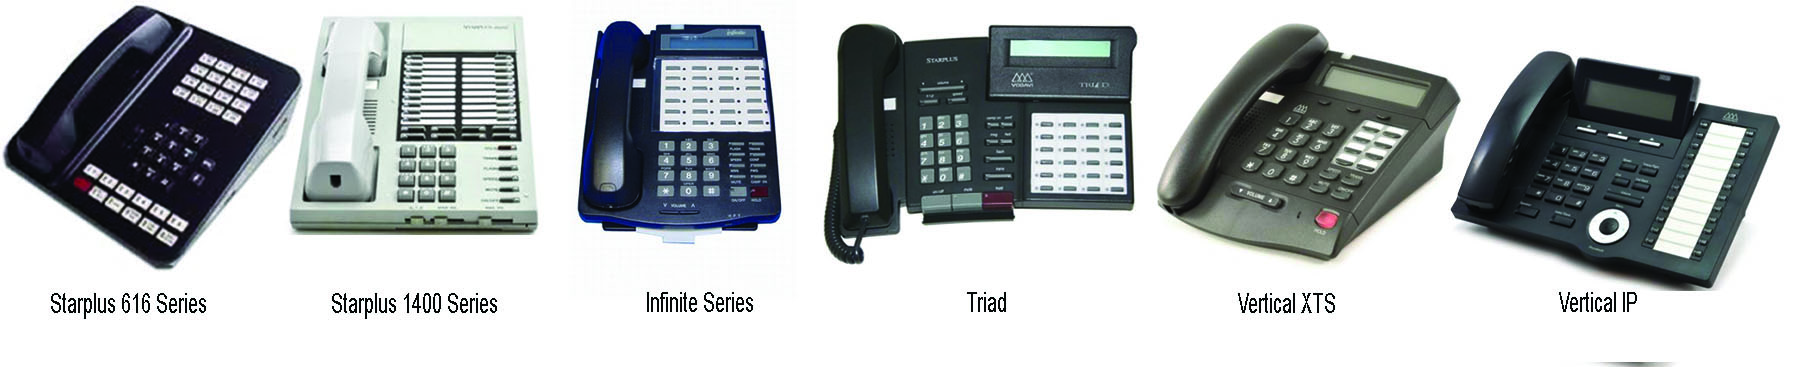 Vodavi Office Telephone Styles